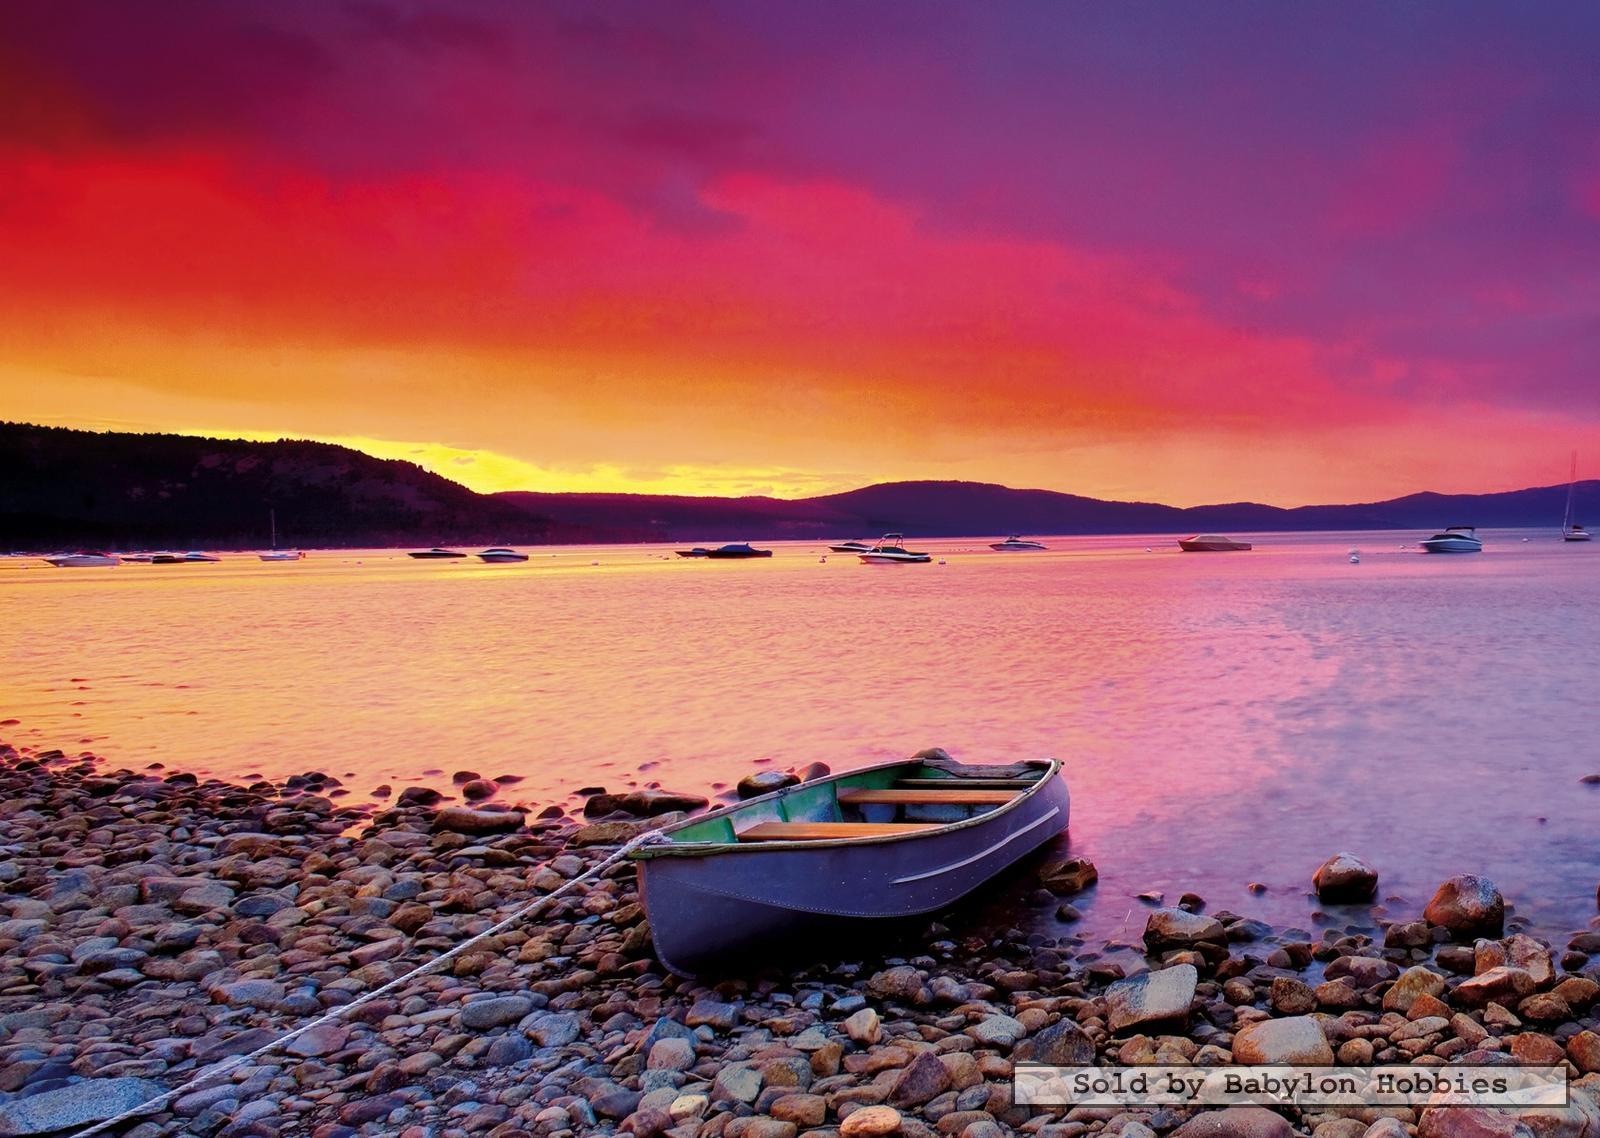 قایقی بر ساحل غروب